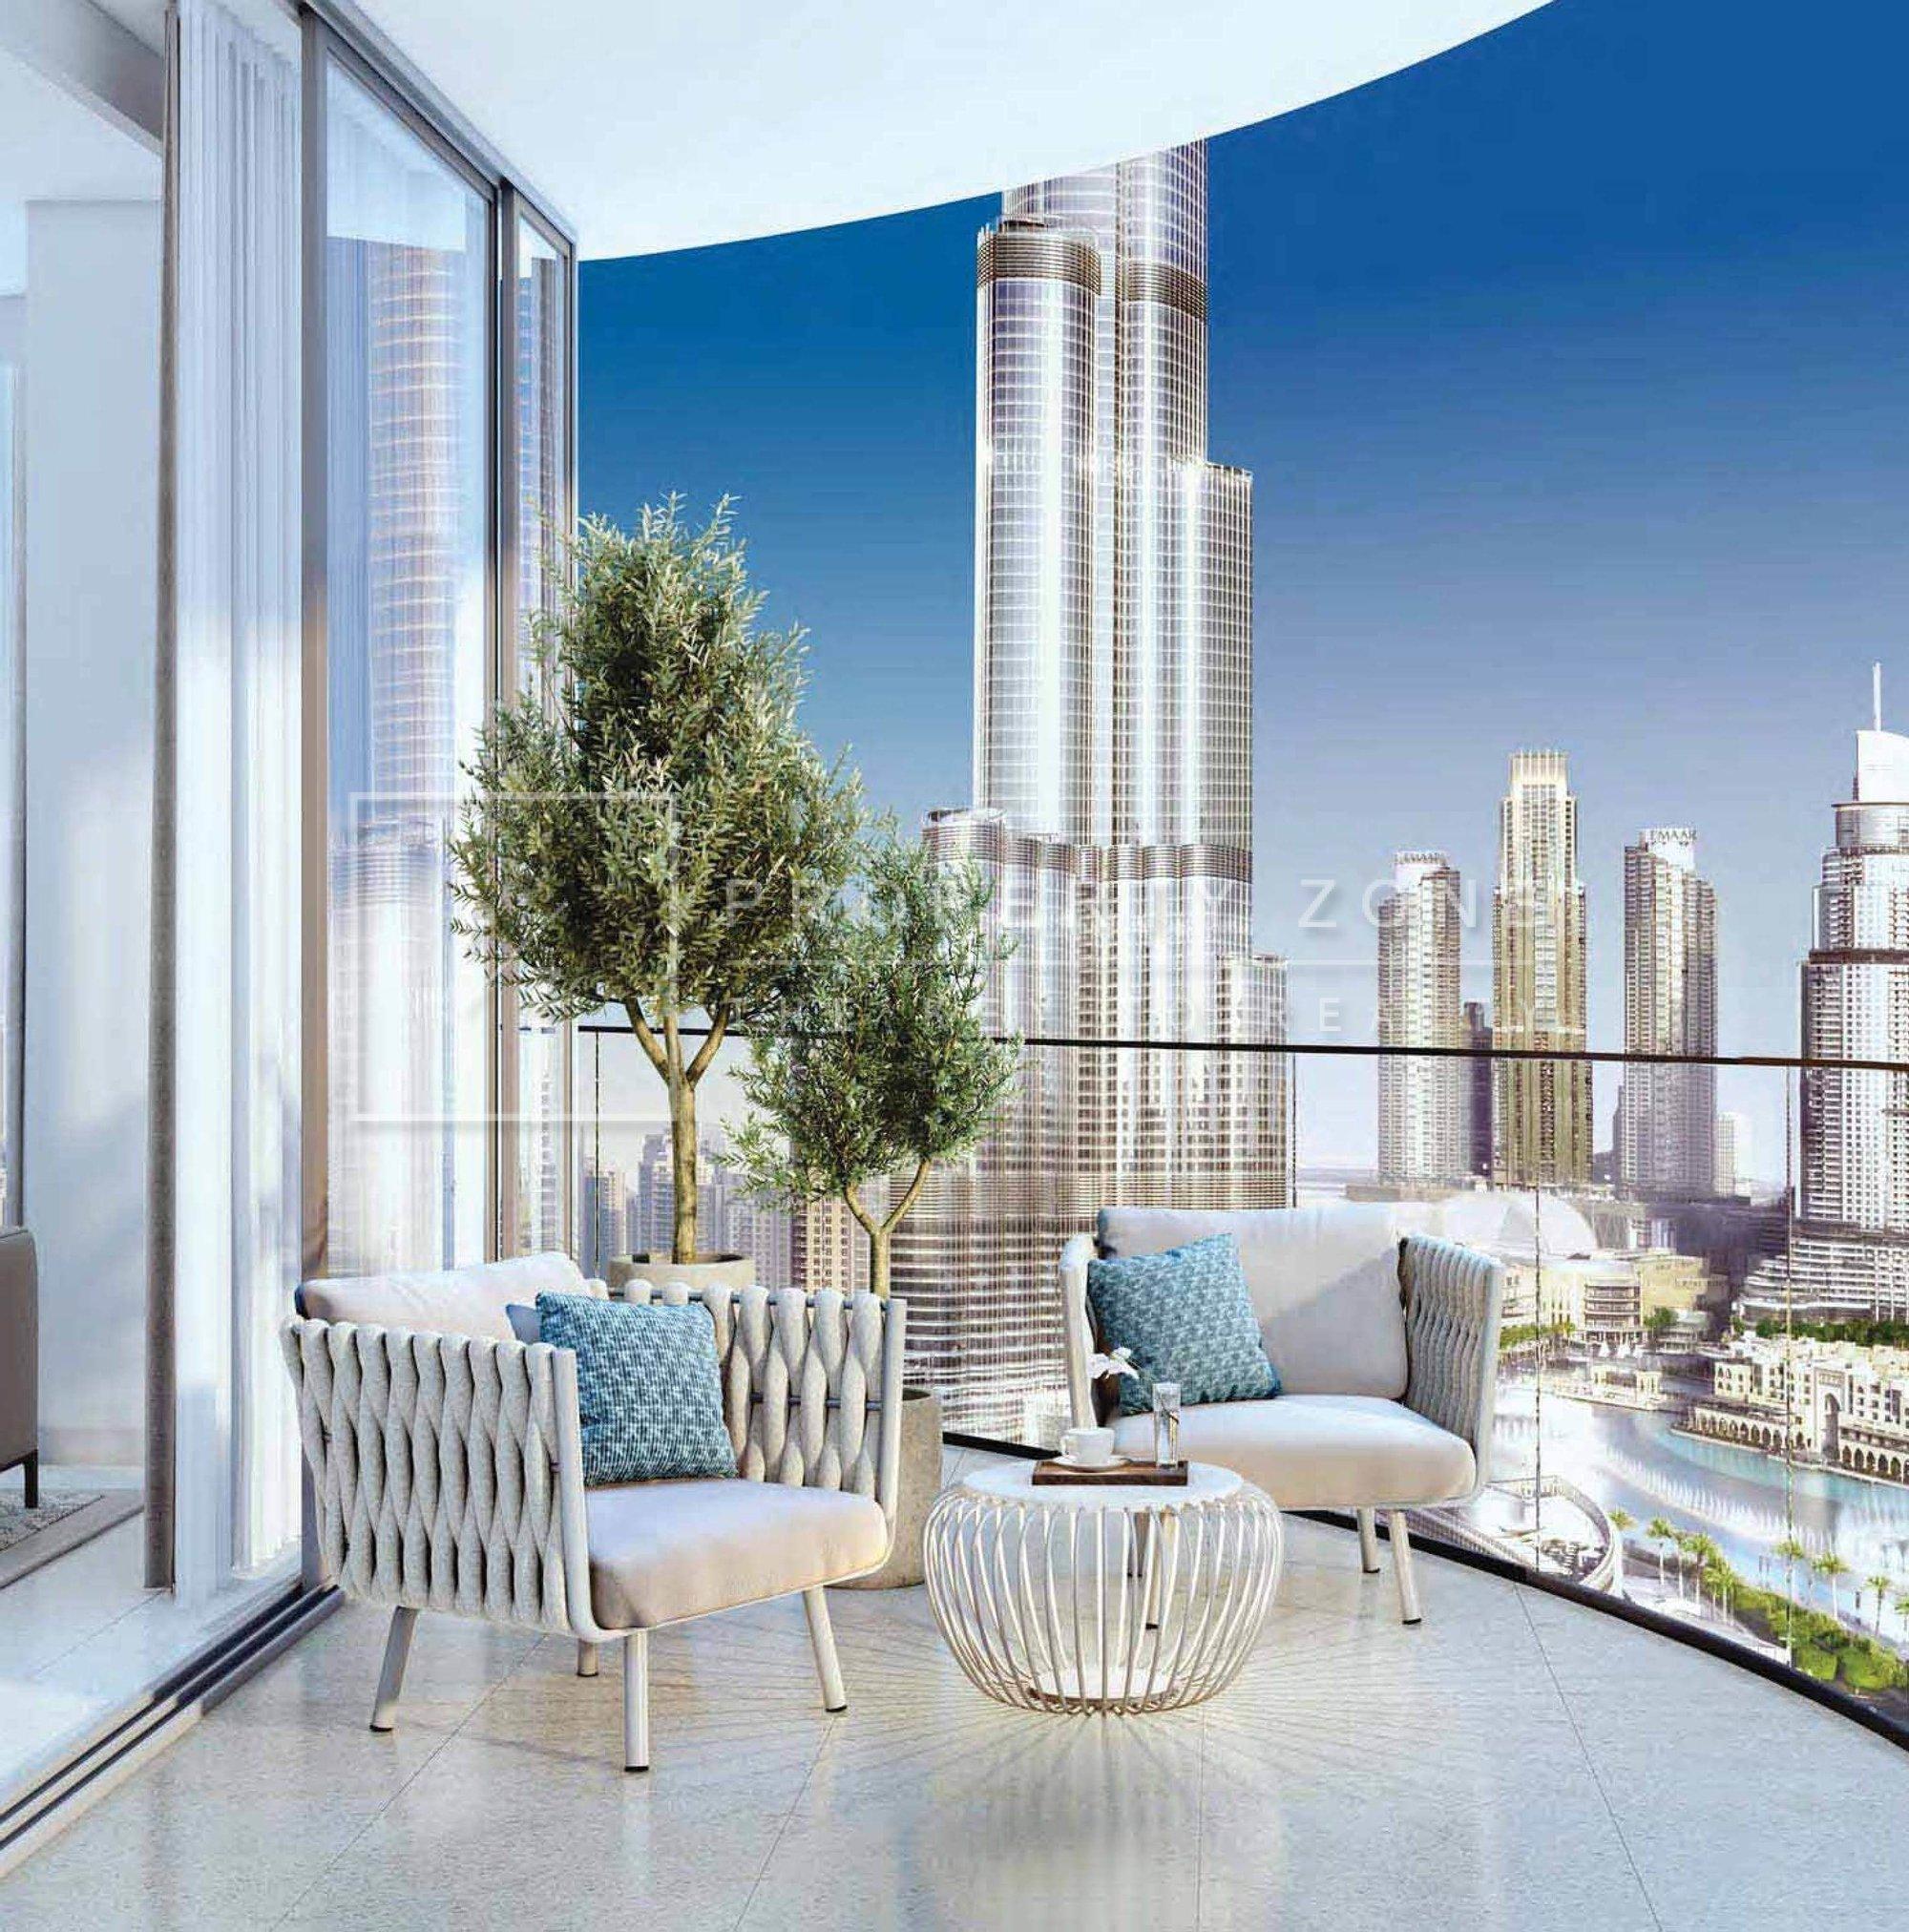 Apartment / Flat For Sell In Downtown Dubai Dubai In Dubai